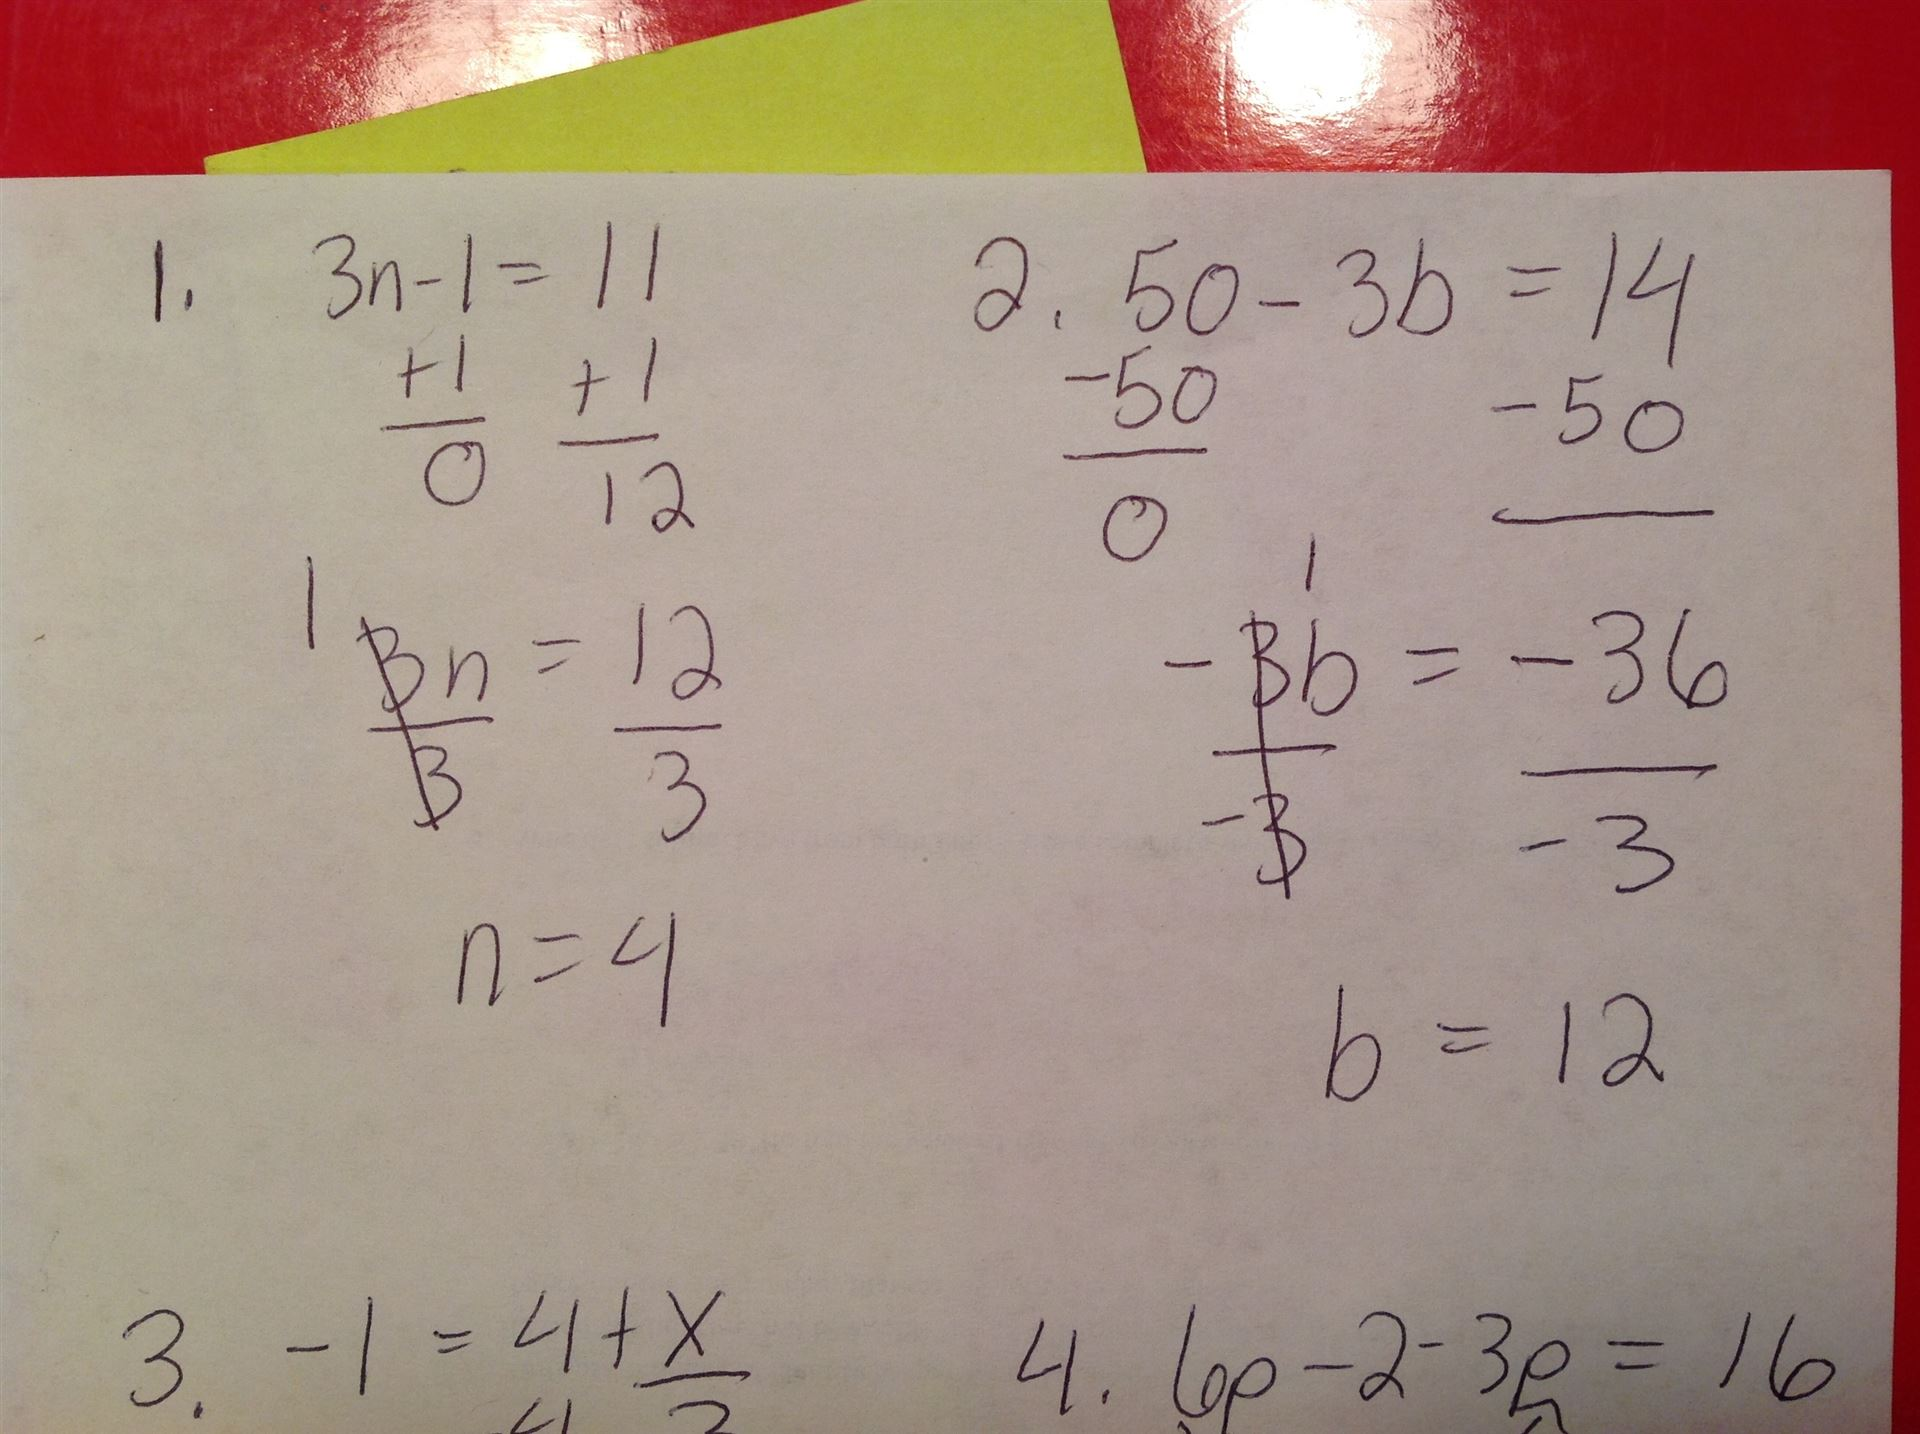 Homework help coorinate variable proofs